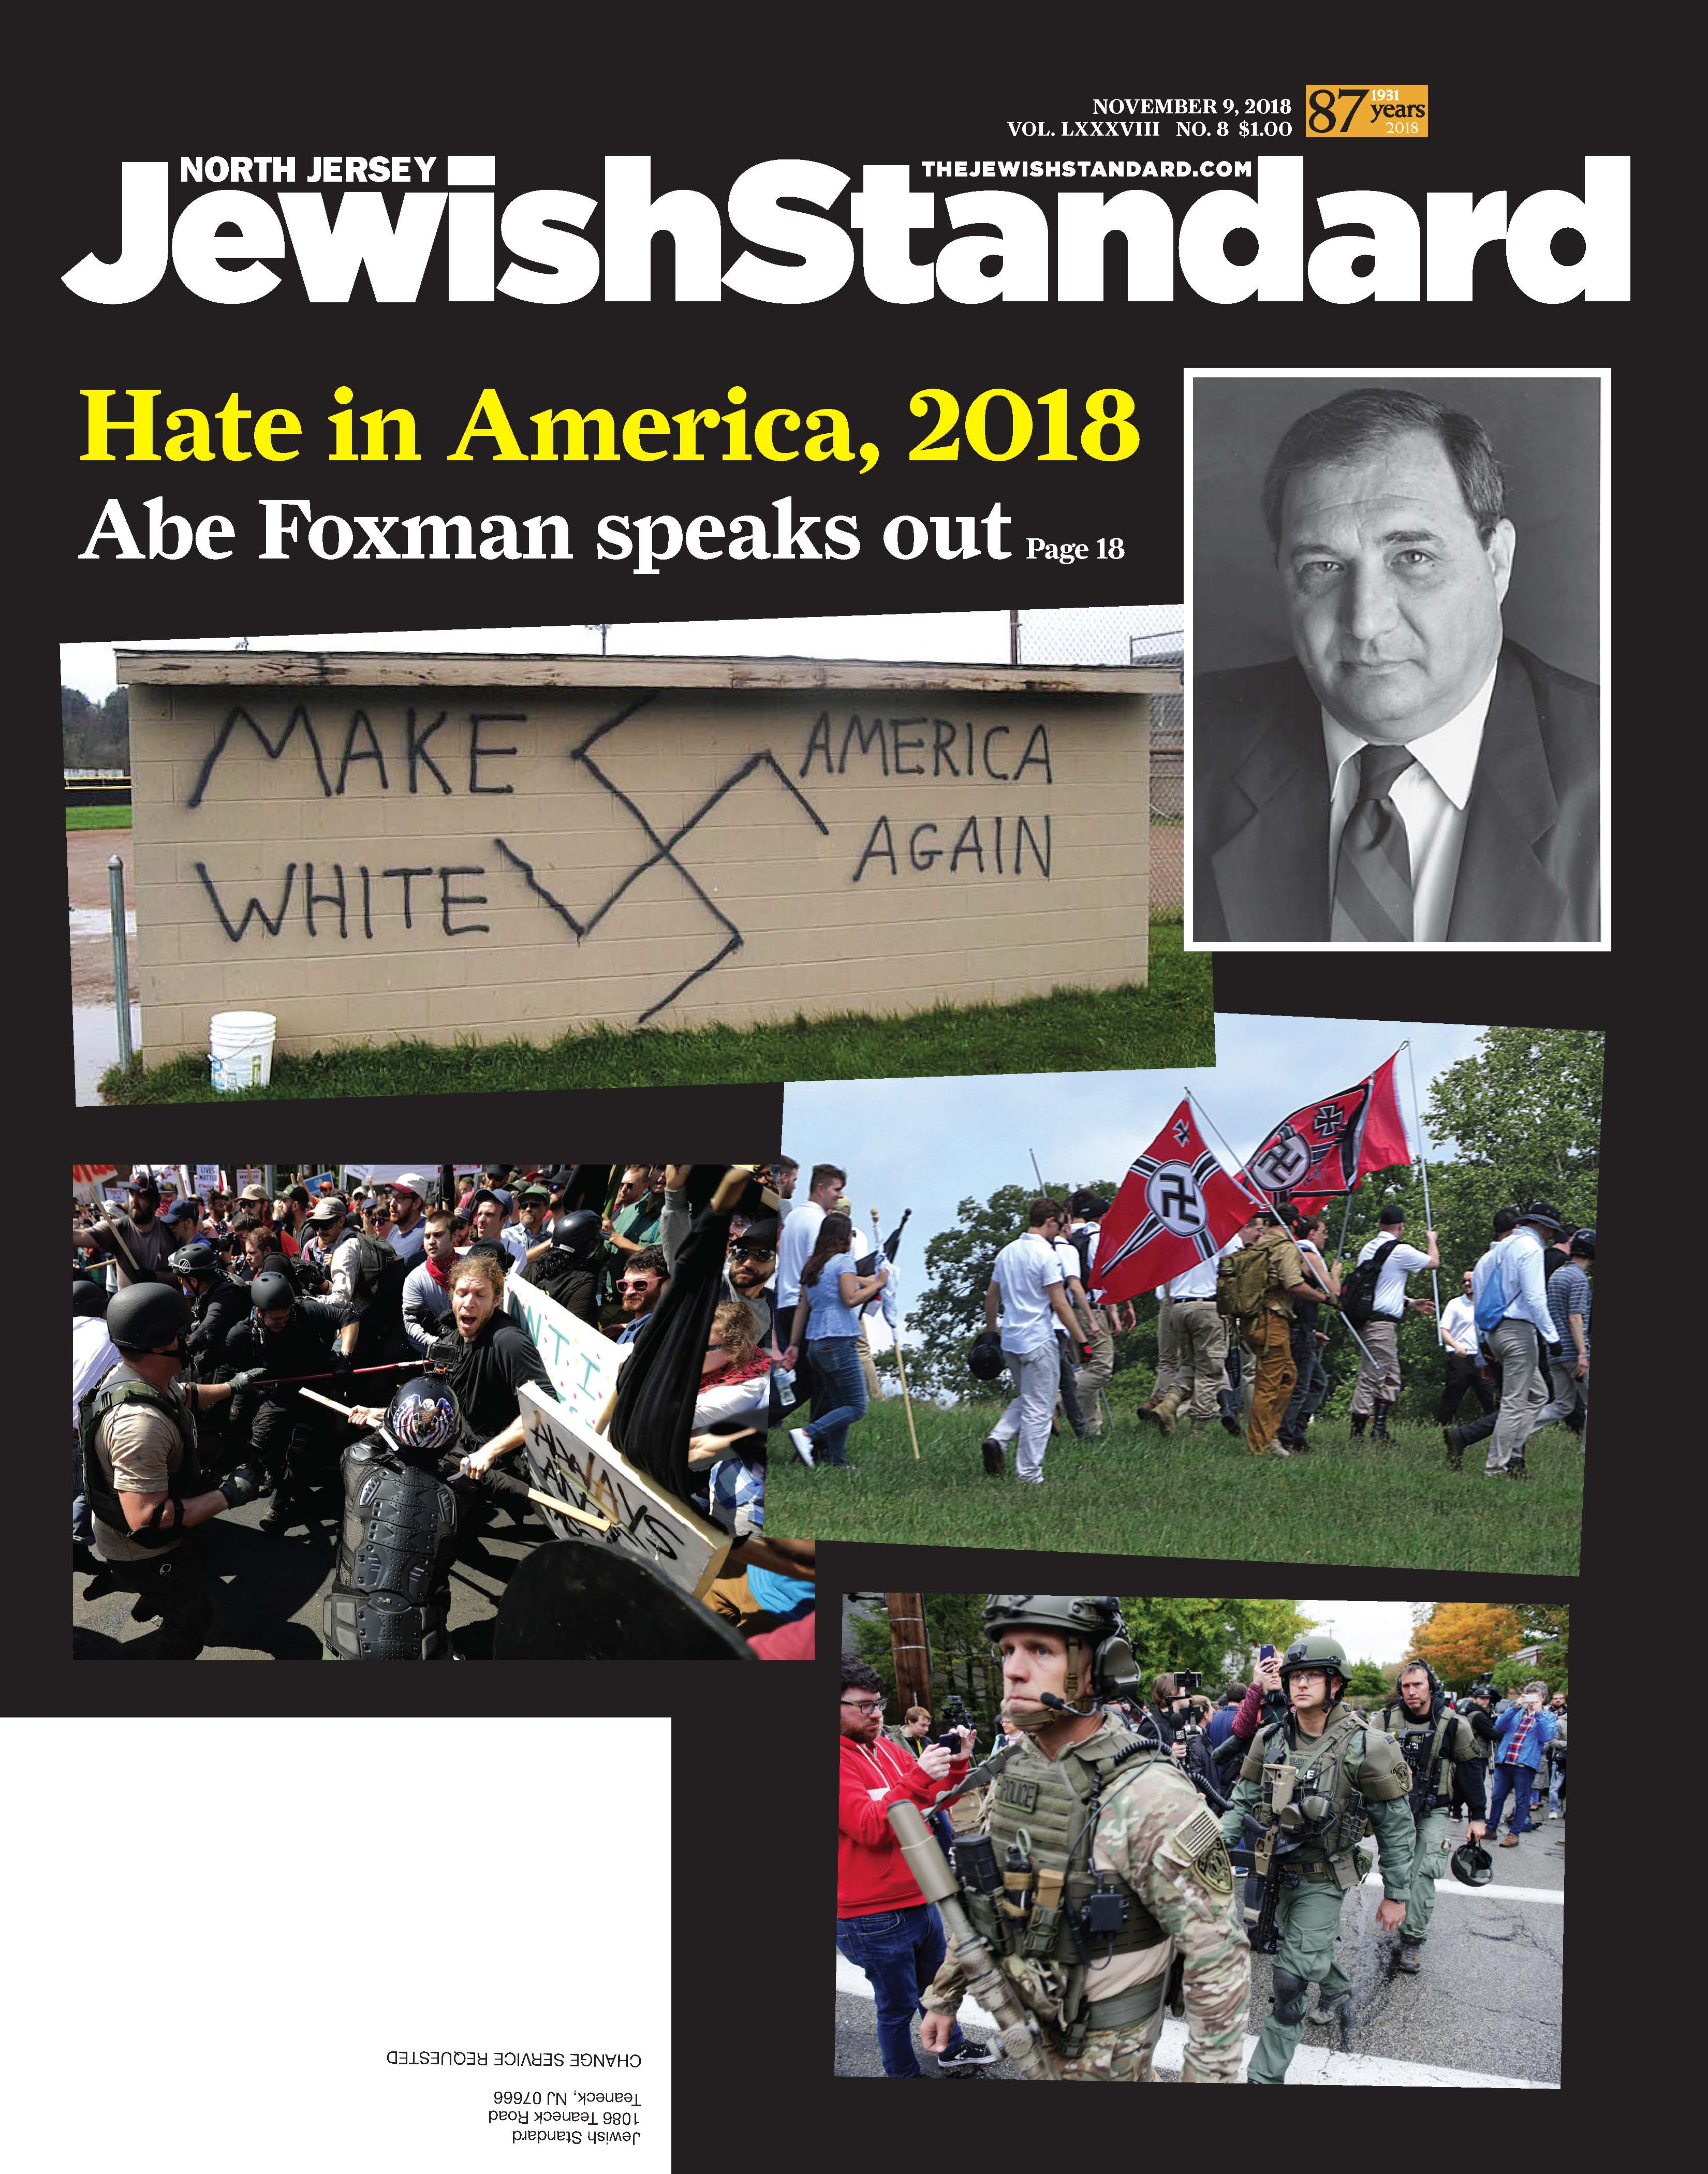 Jewish Standard, November 9, 2018